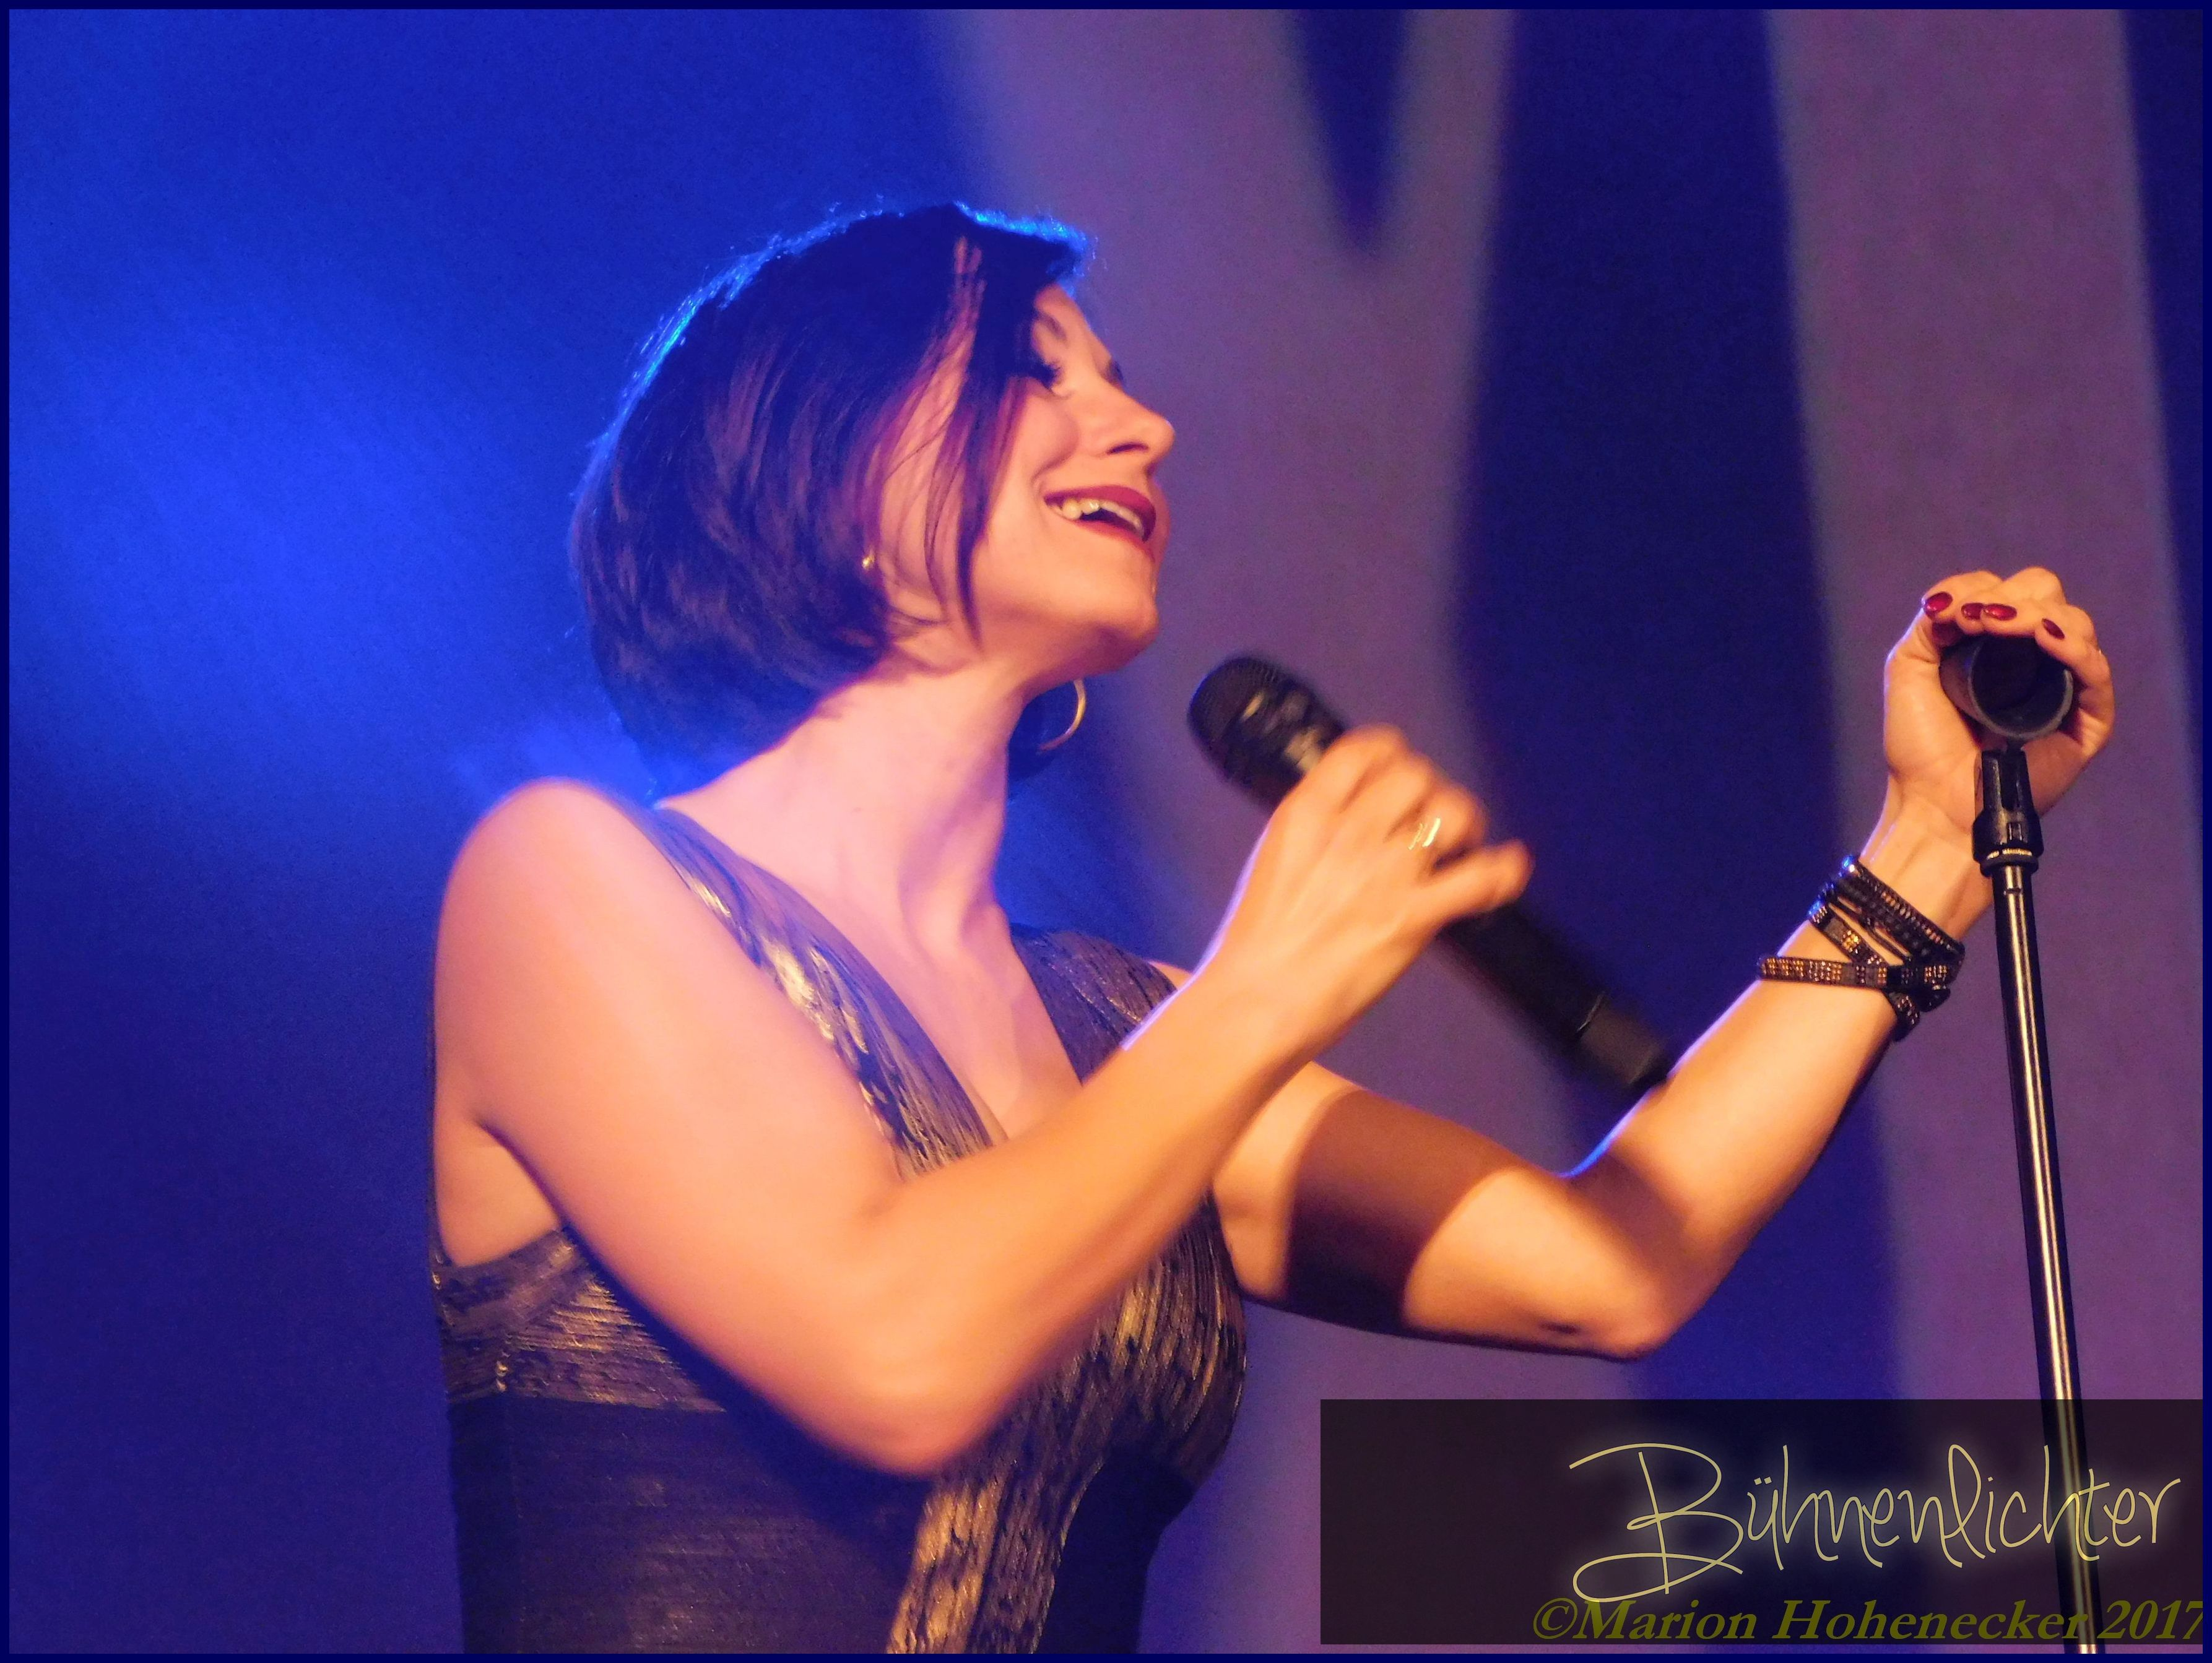 DSCN1064-Musical-meets-rock-2017-(c)-Marion-Hohenecker